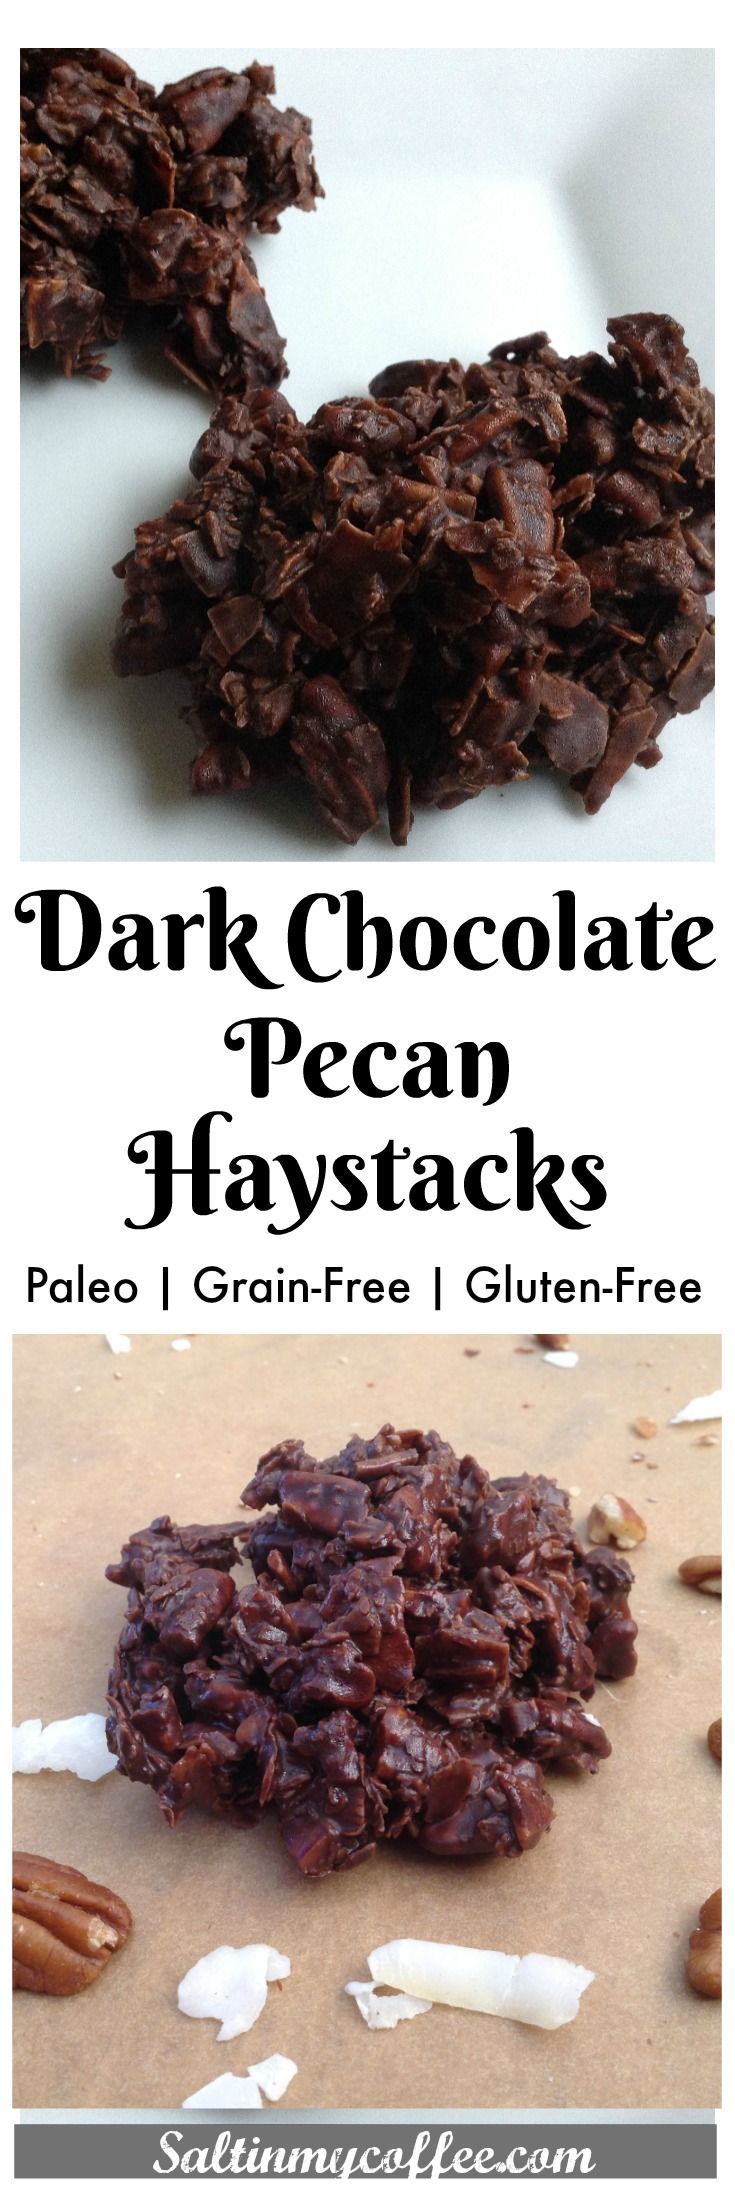 Best 20+ Chocolate haystacks ideas on Pinterest | Haystack candy ...